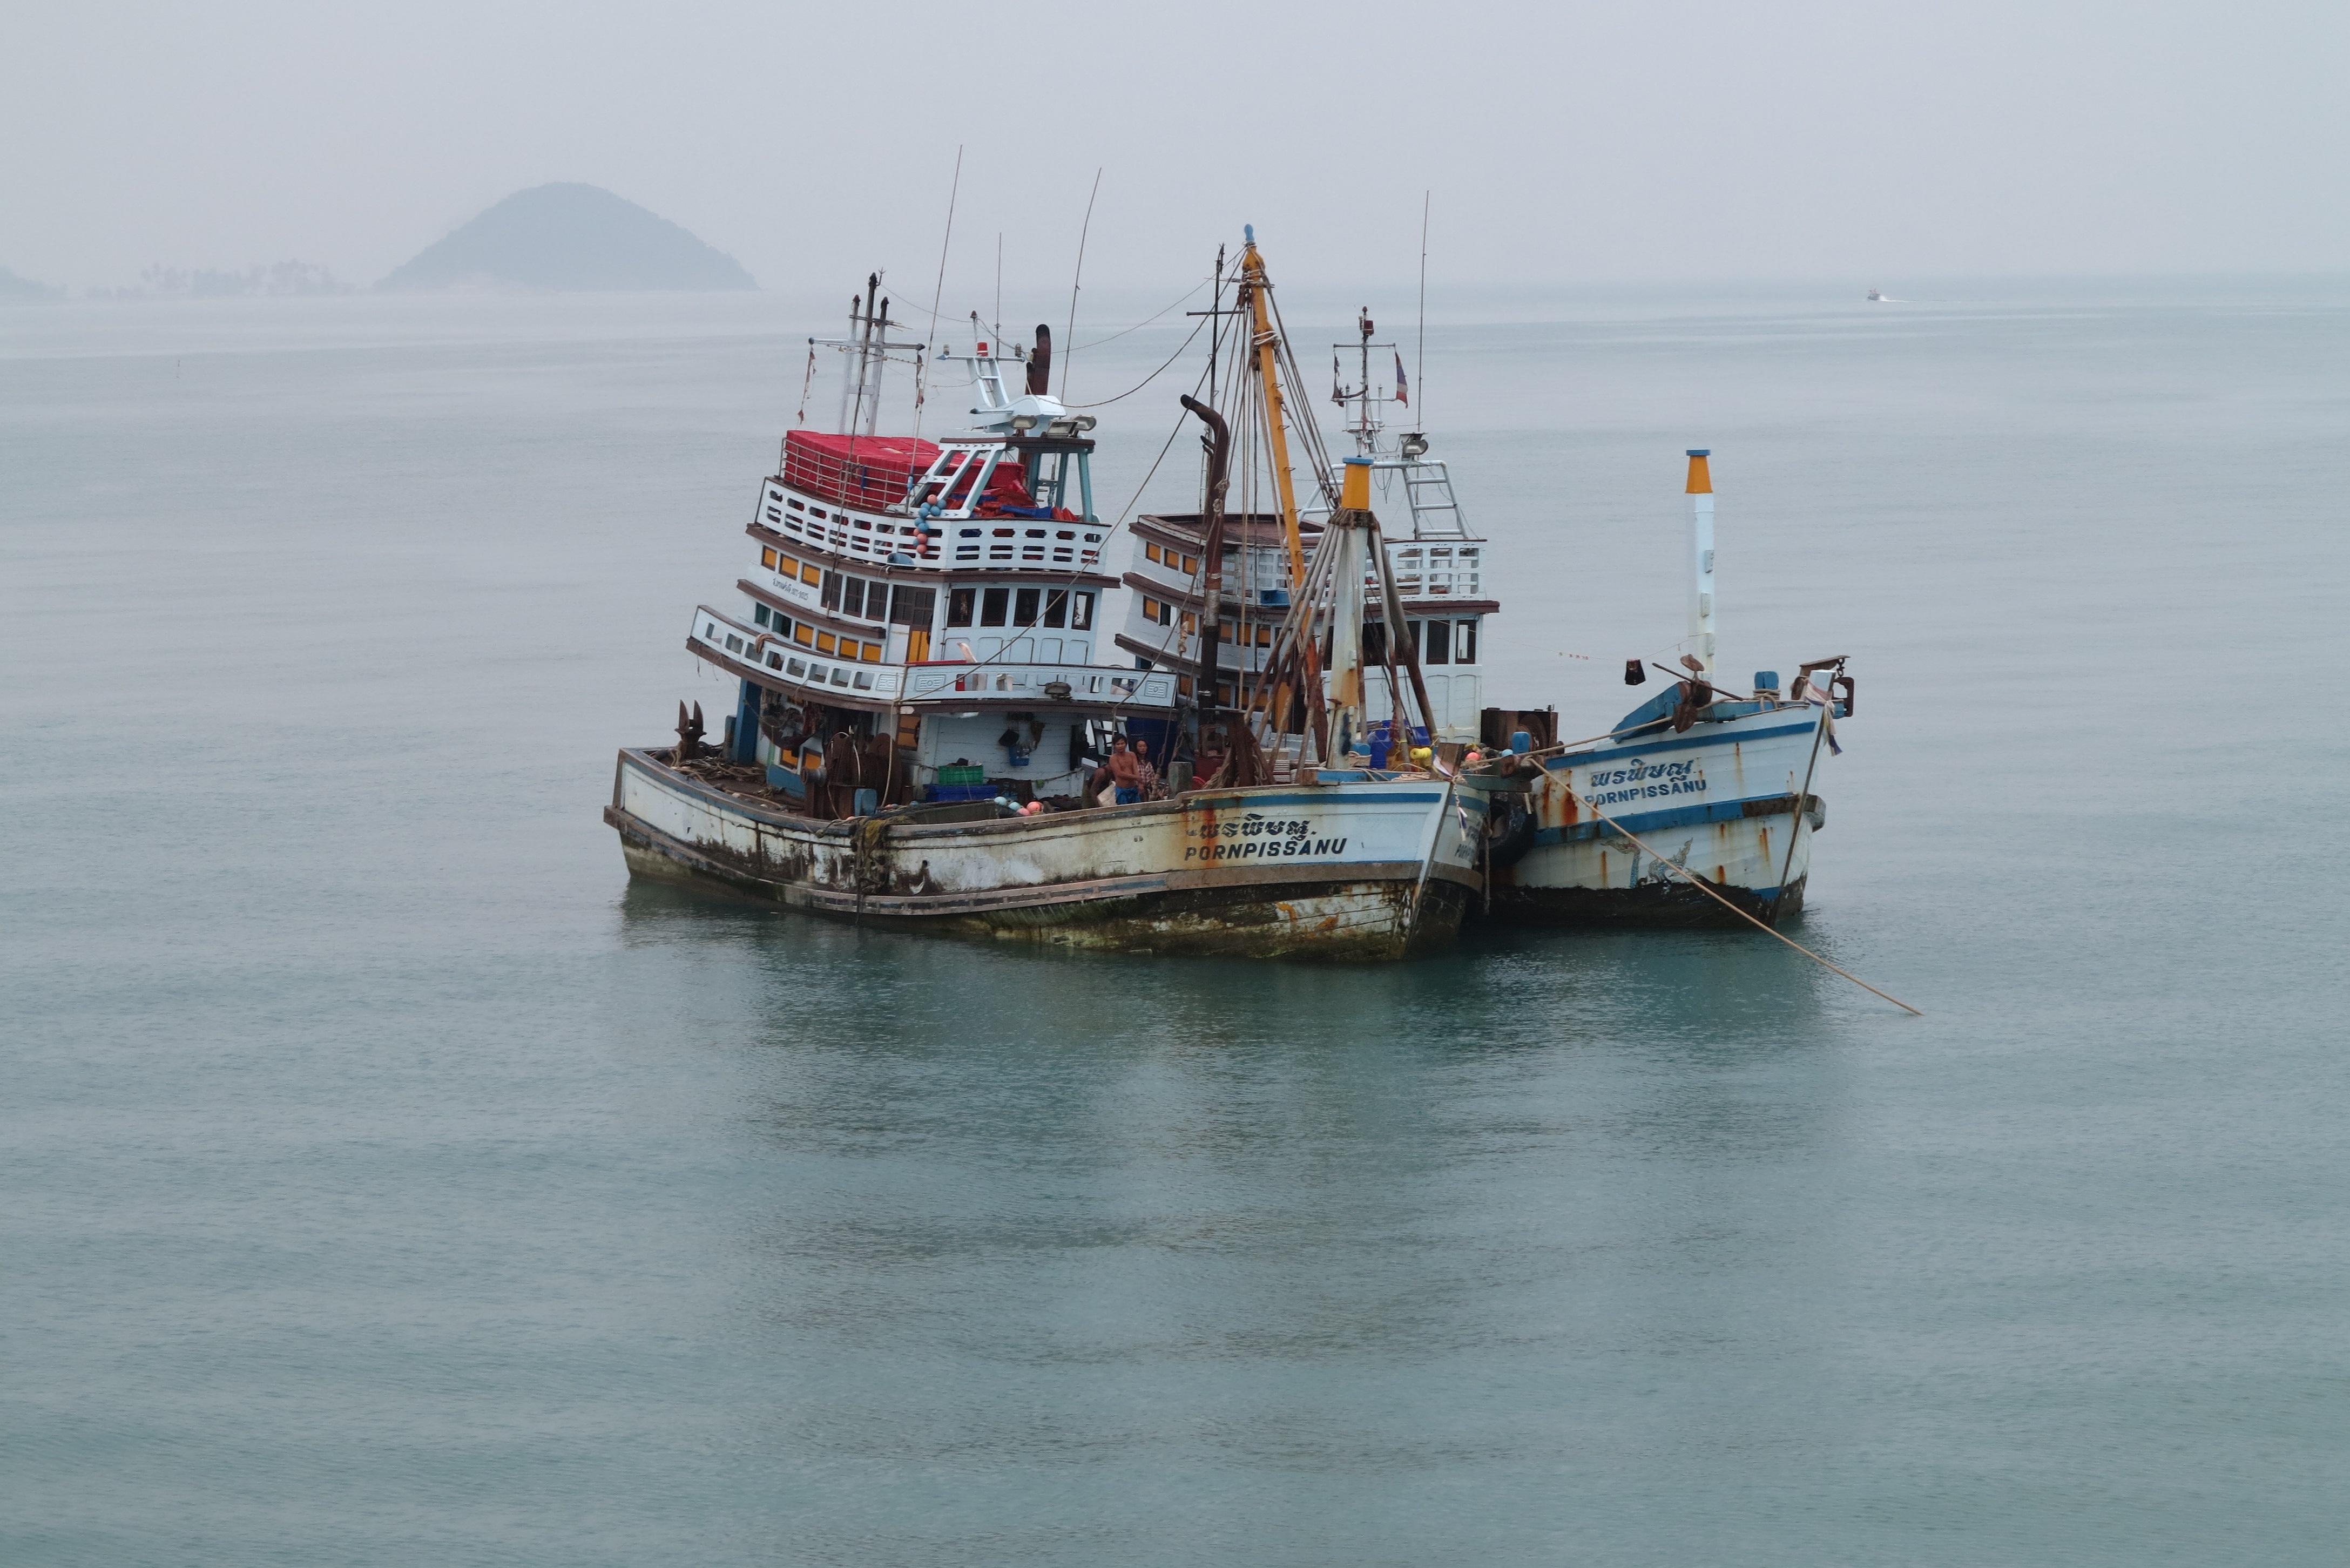 Free Images : landscape, sea, coast, water, ocean, ship